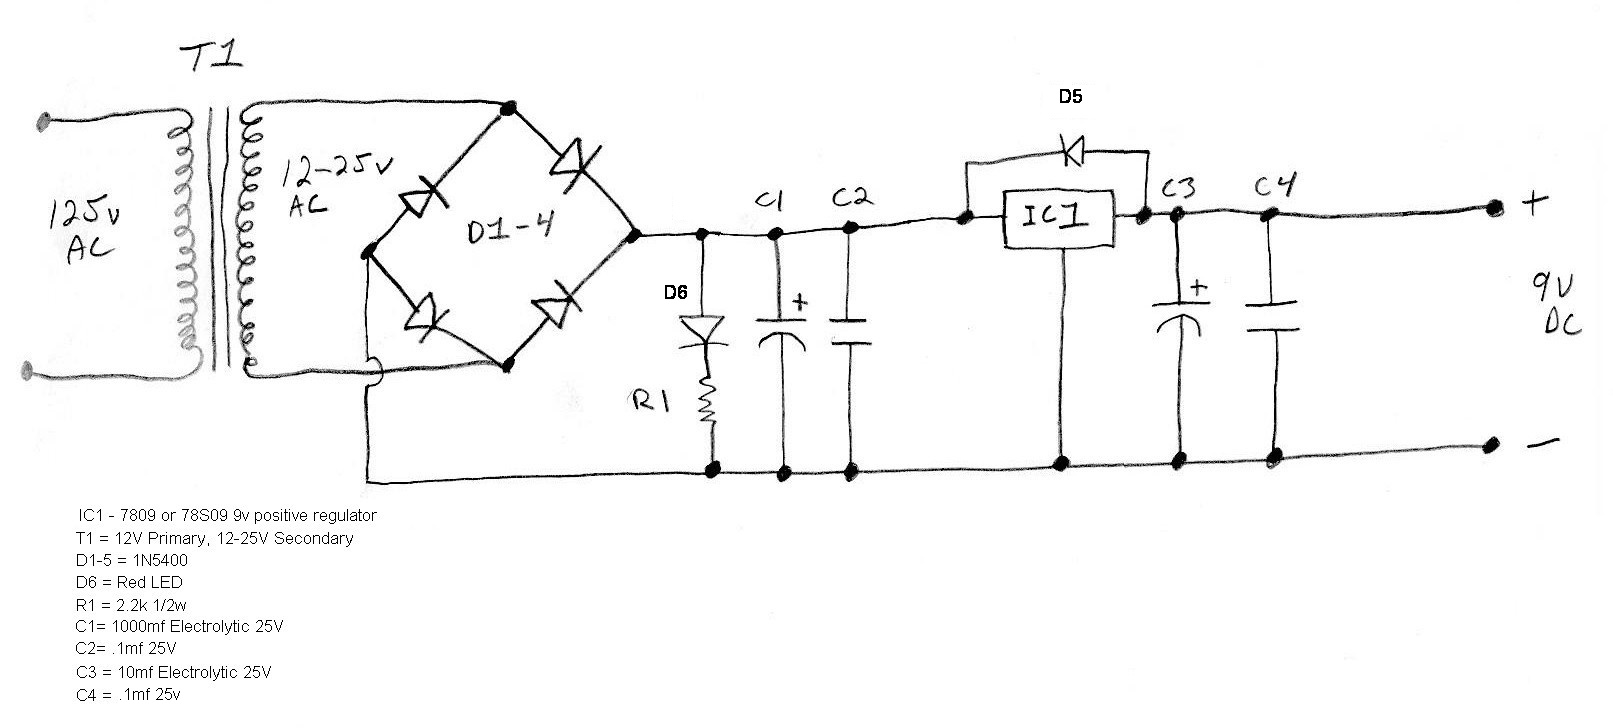 hight resolution of wrg 6786 power cord schematicpower cord schematic 10